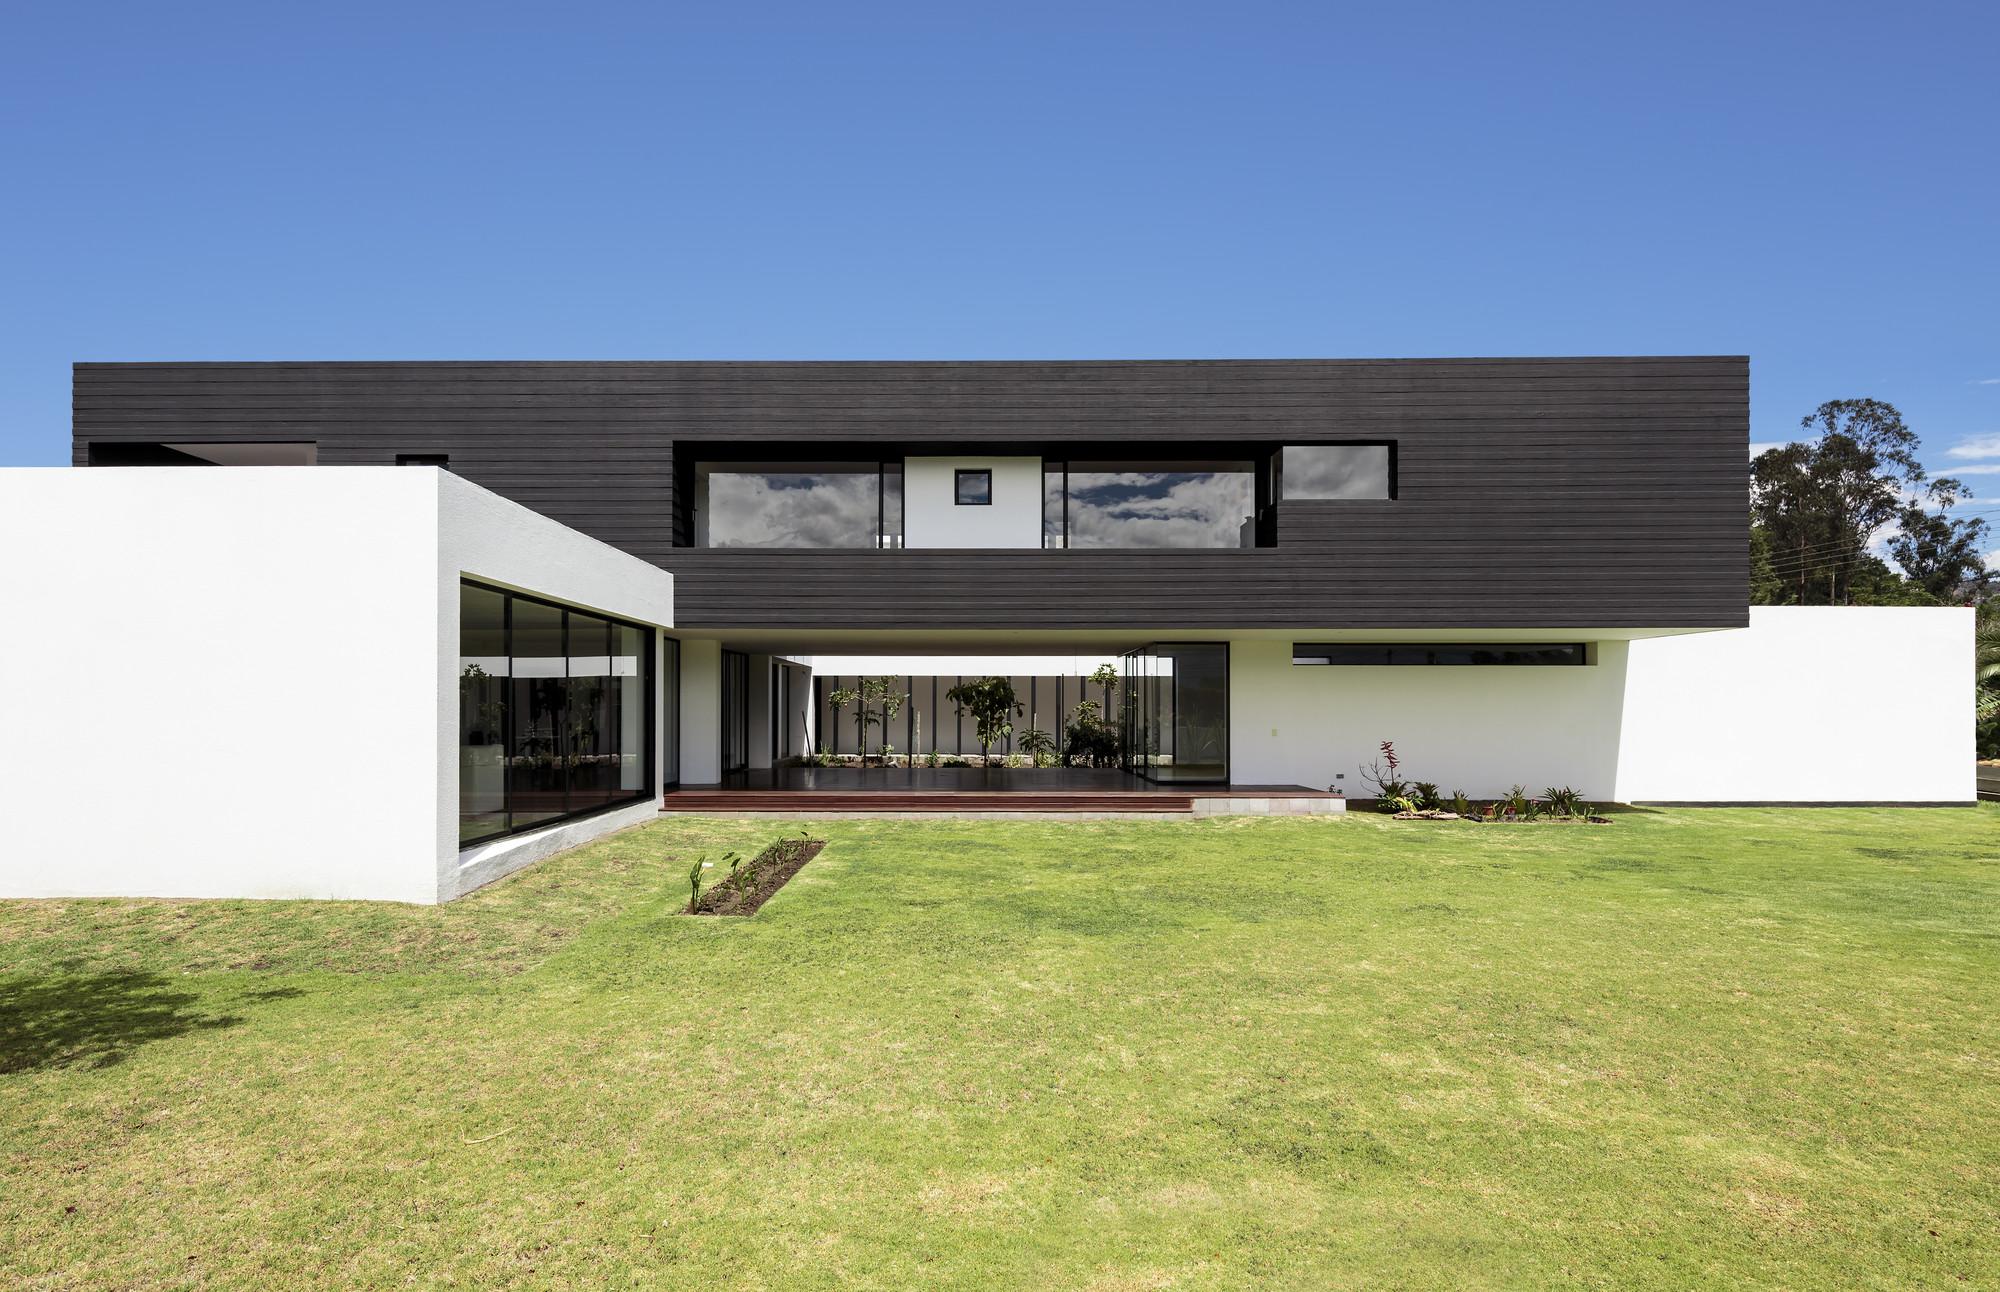 Puente House / Diez + Muller Arquitectos, © Sebastián Crespo